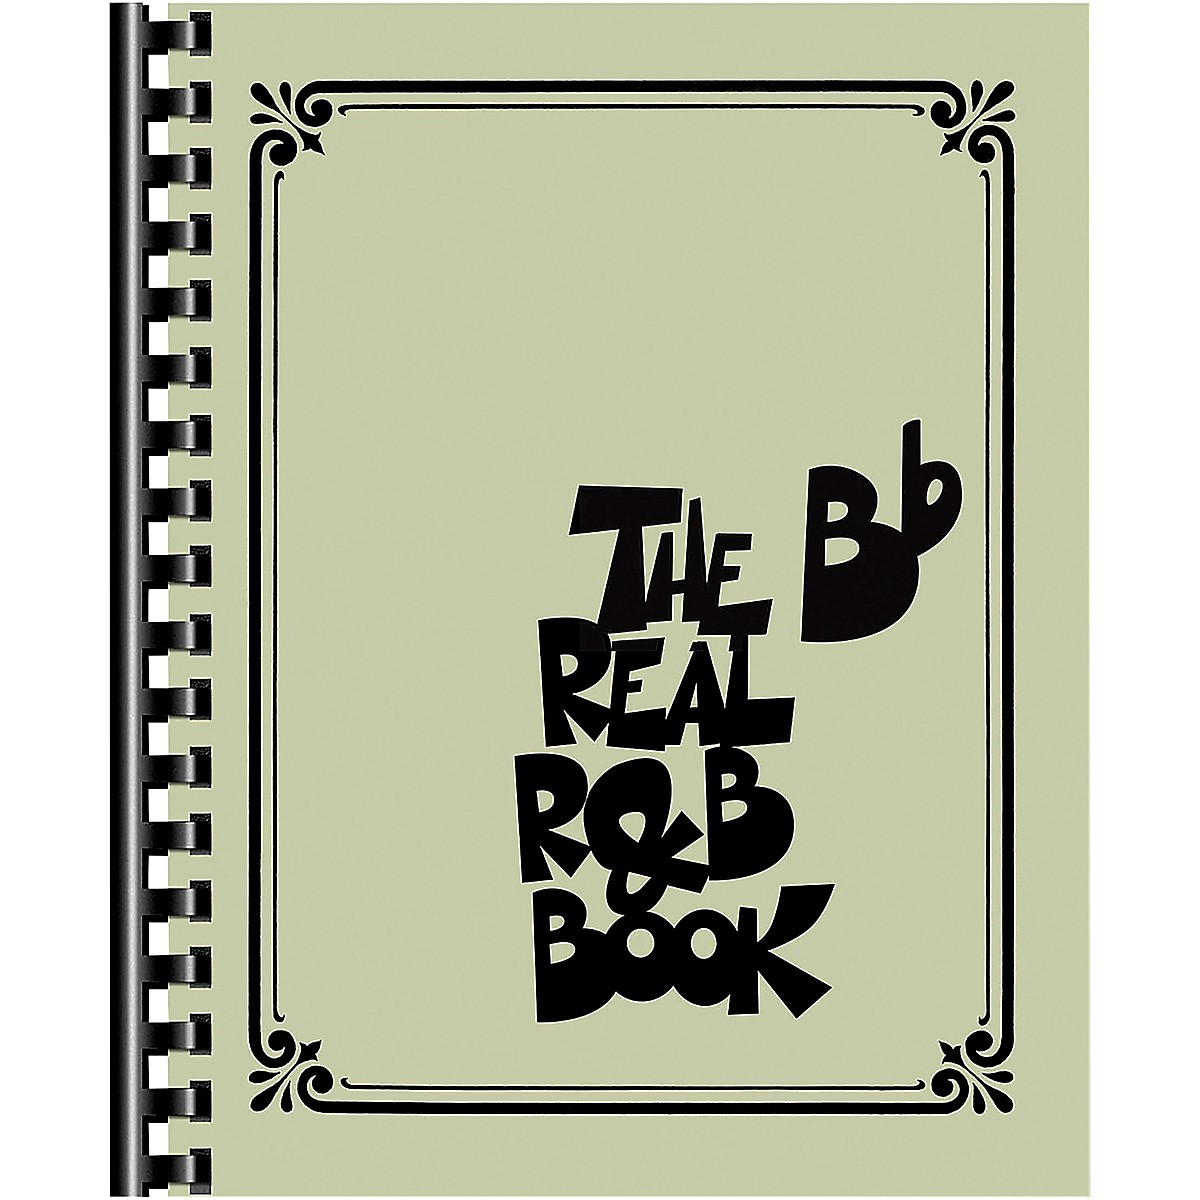 Hal Leonard The Real R&B Book (B-Flat Instruments) Fake Book